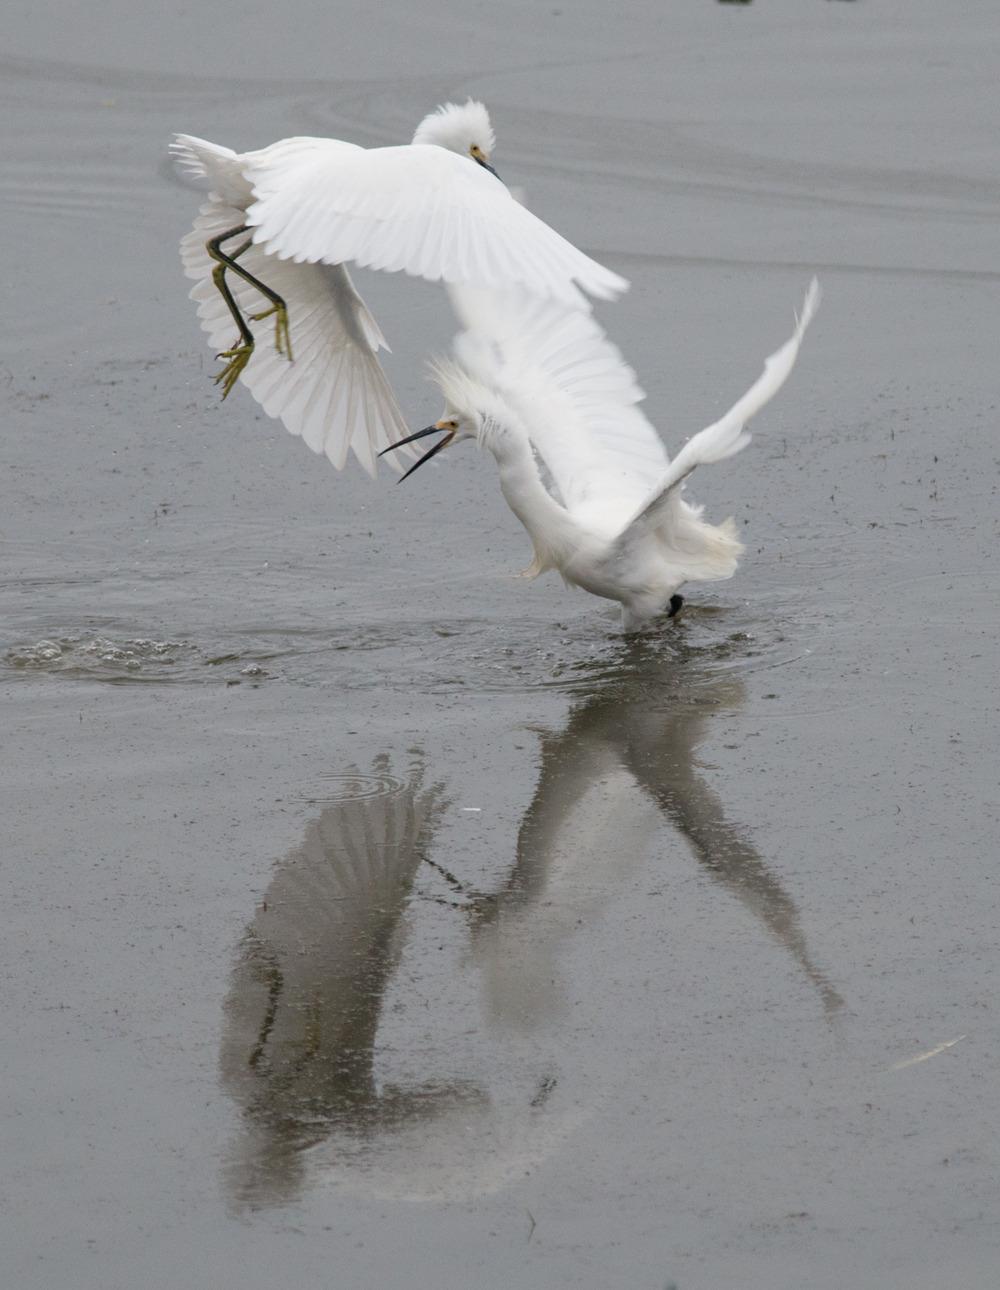 Snowy Egret (Egretta thula)   Setting: 500mm, f/4.8, 1/500s, ISO1400, VR on